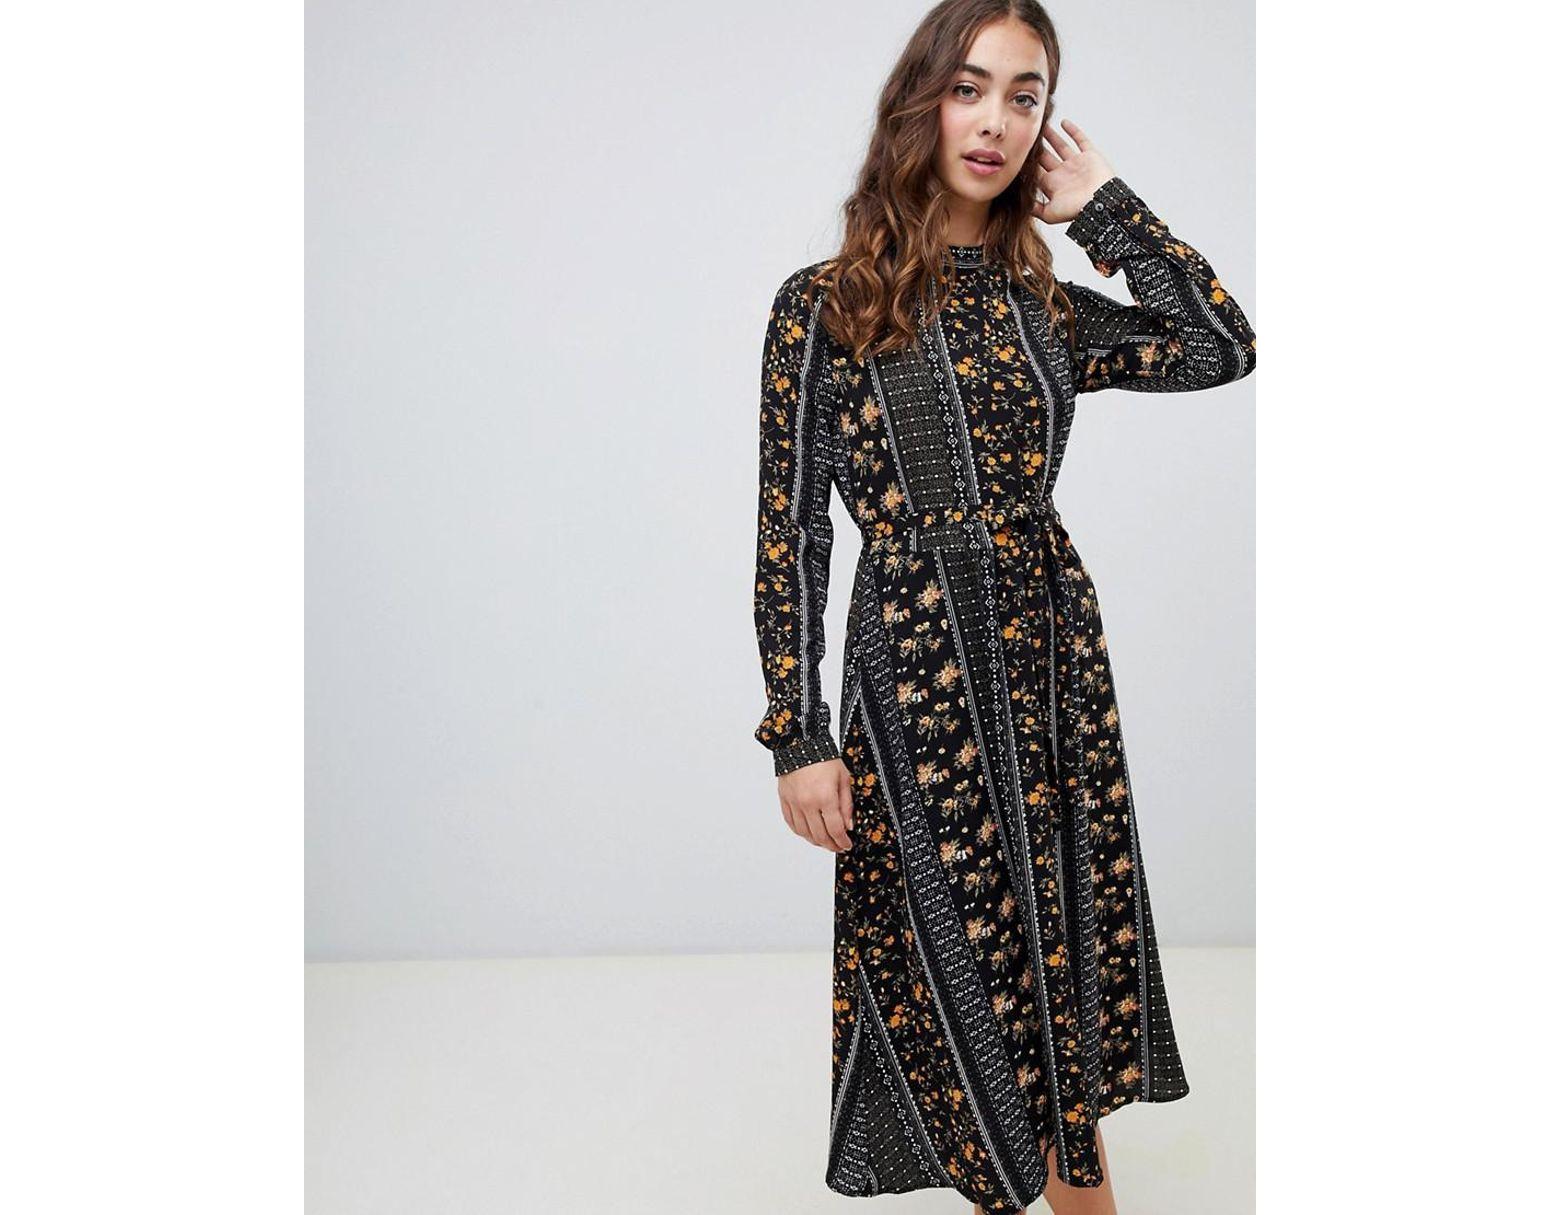 ad3de879dd25 Vero Moda Mix And Match Print Mini Dress In Black in Black - Lyst